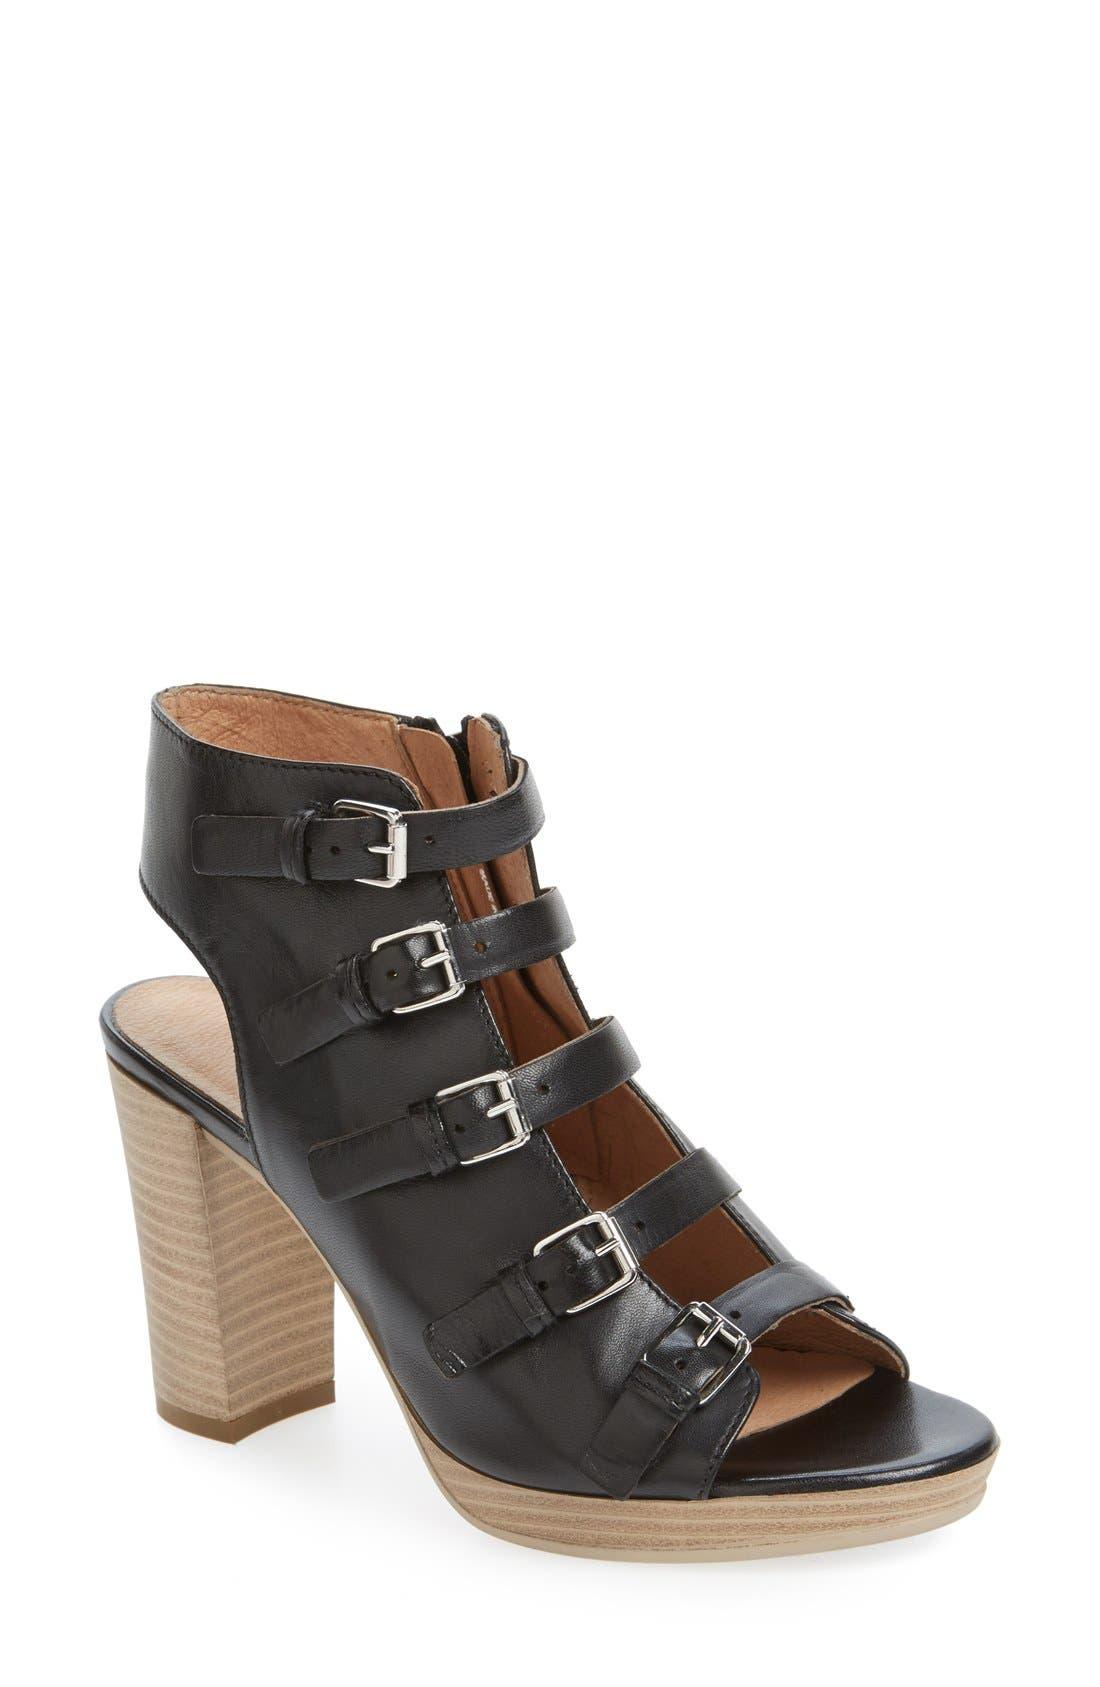 'Kennedy' Buckle Strap Block Heel Sandal,                         Main,                         color, 001